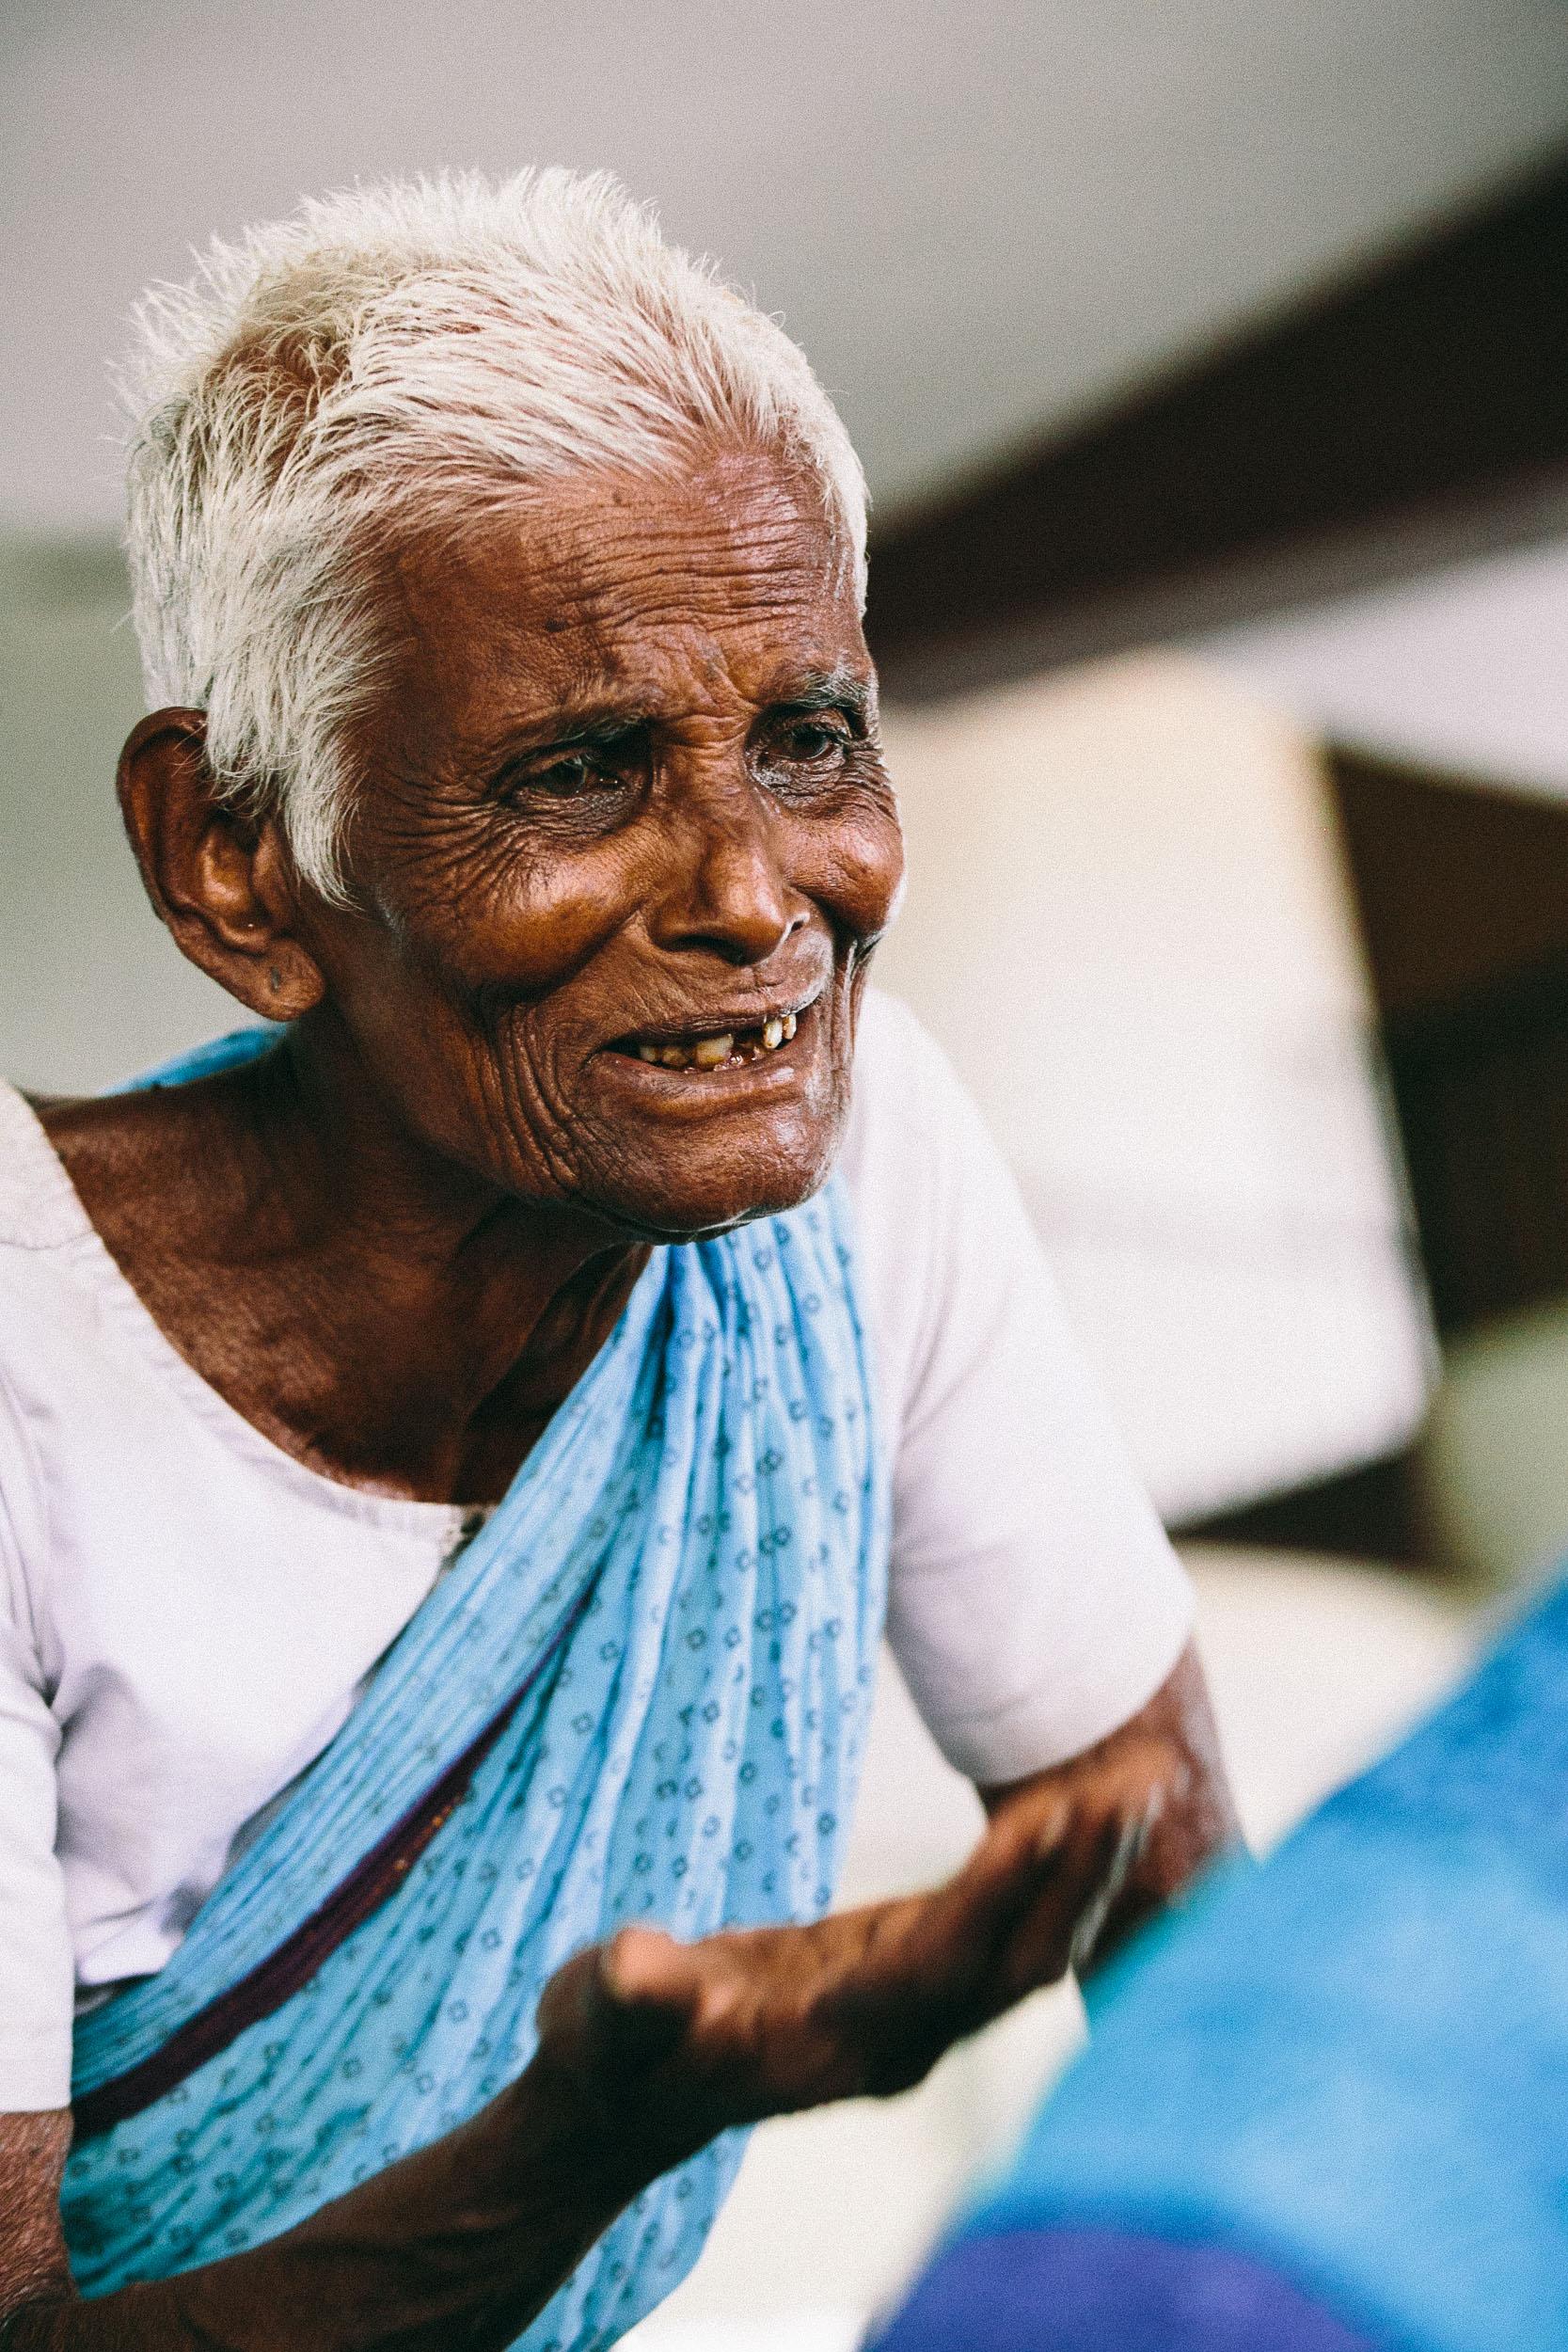 brian-callaway-india-photography-aravind-eye-hospital-28.jpg